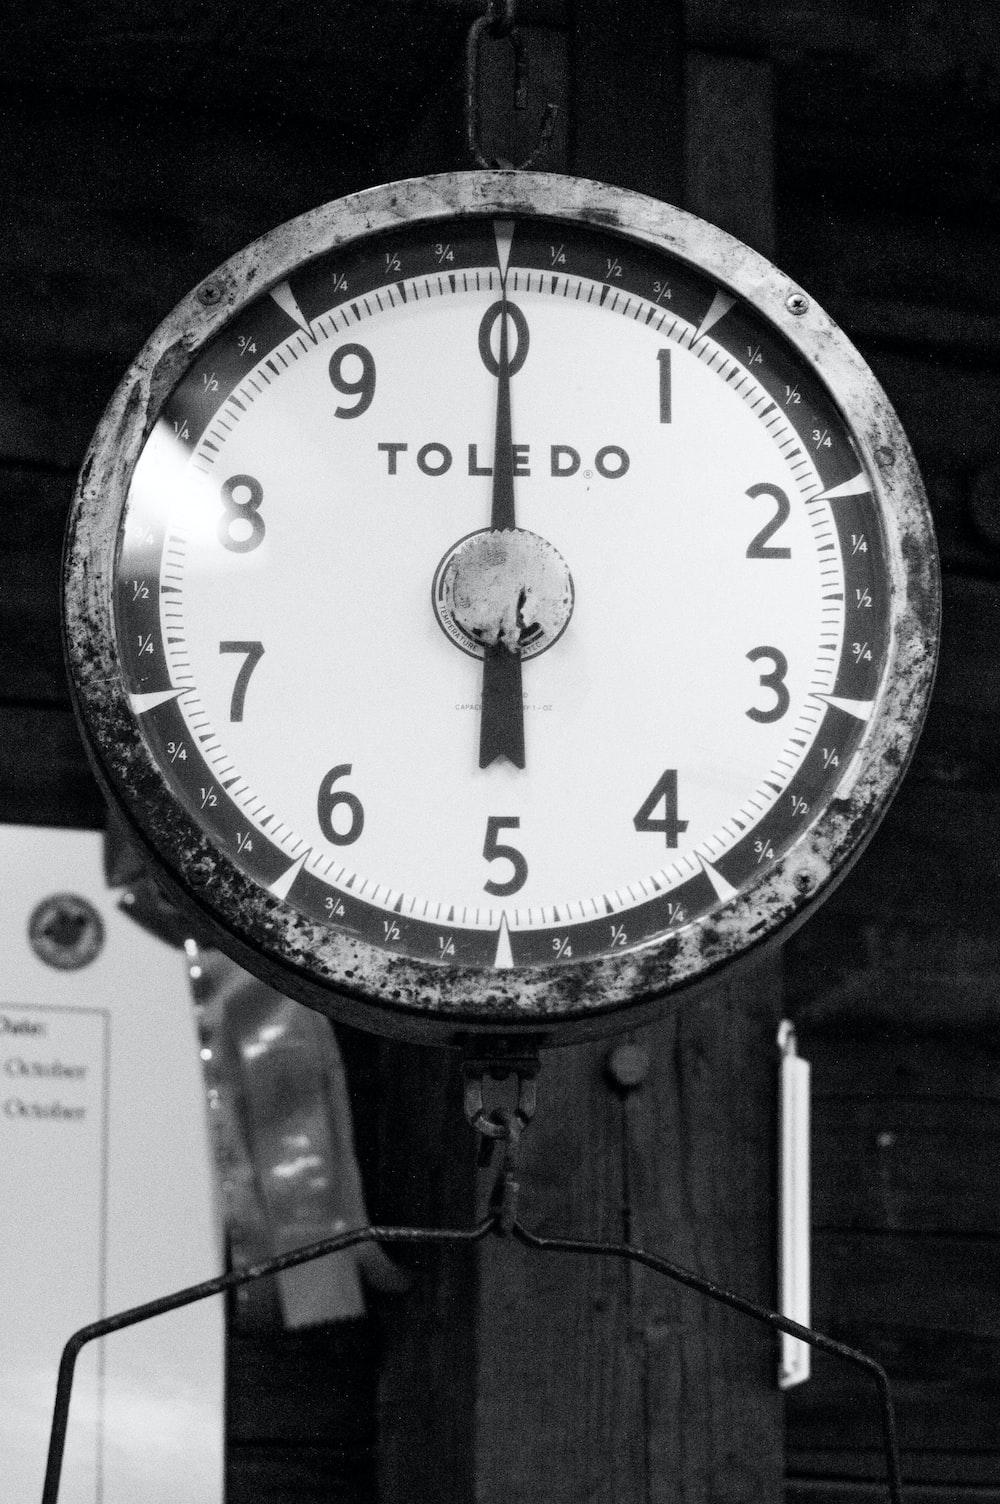 round Toledo analog clock